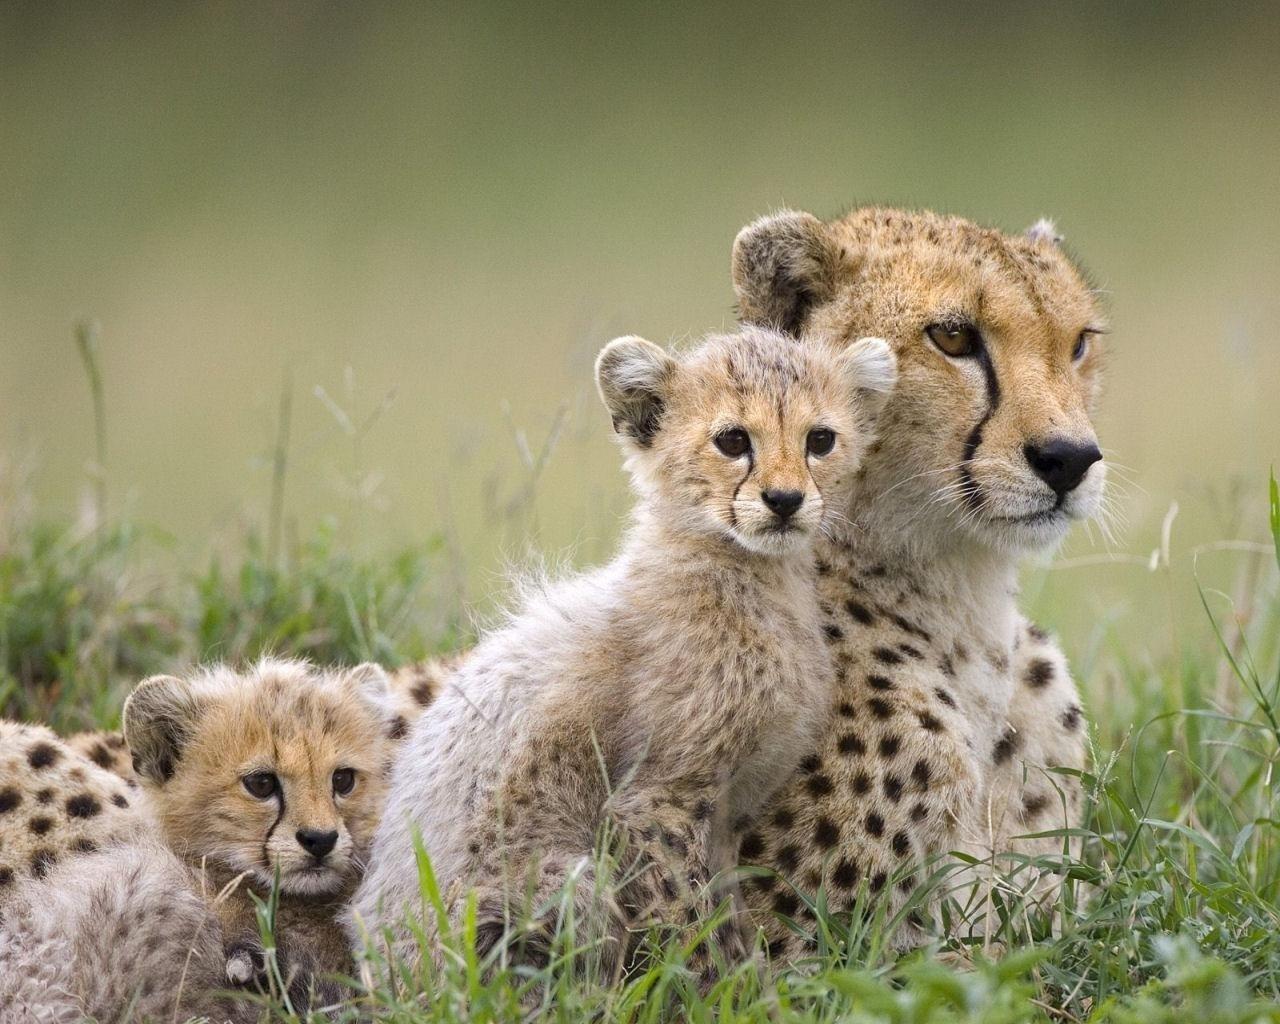 cheetah images free